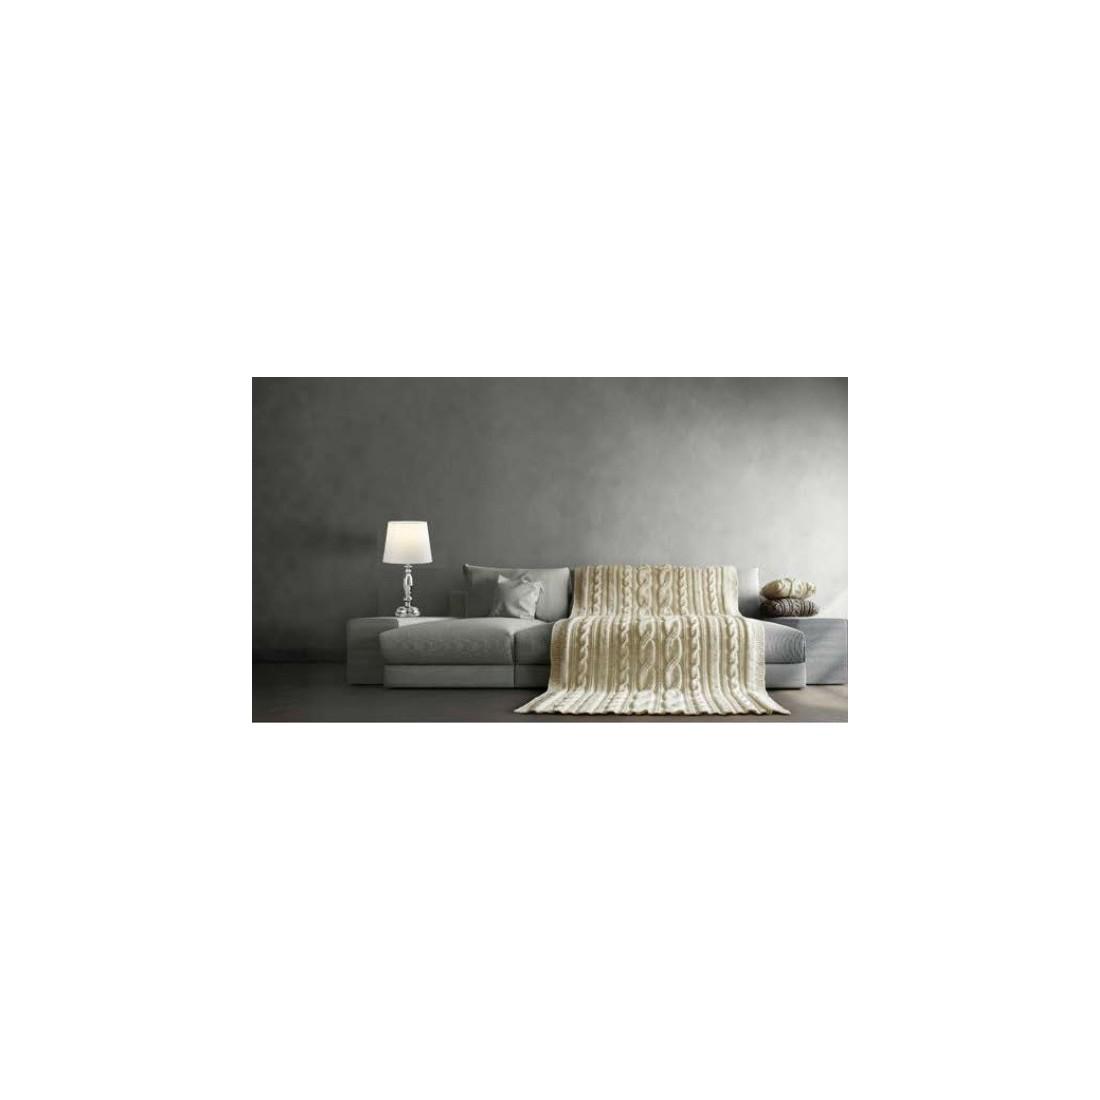 L mpara para dormitorio color morado ofertas env o - Lamparas para dormitorios de matrimonio ...